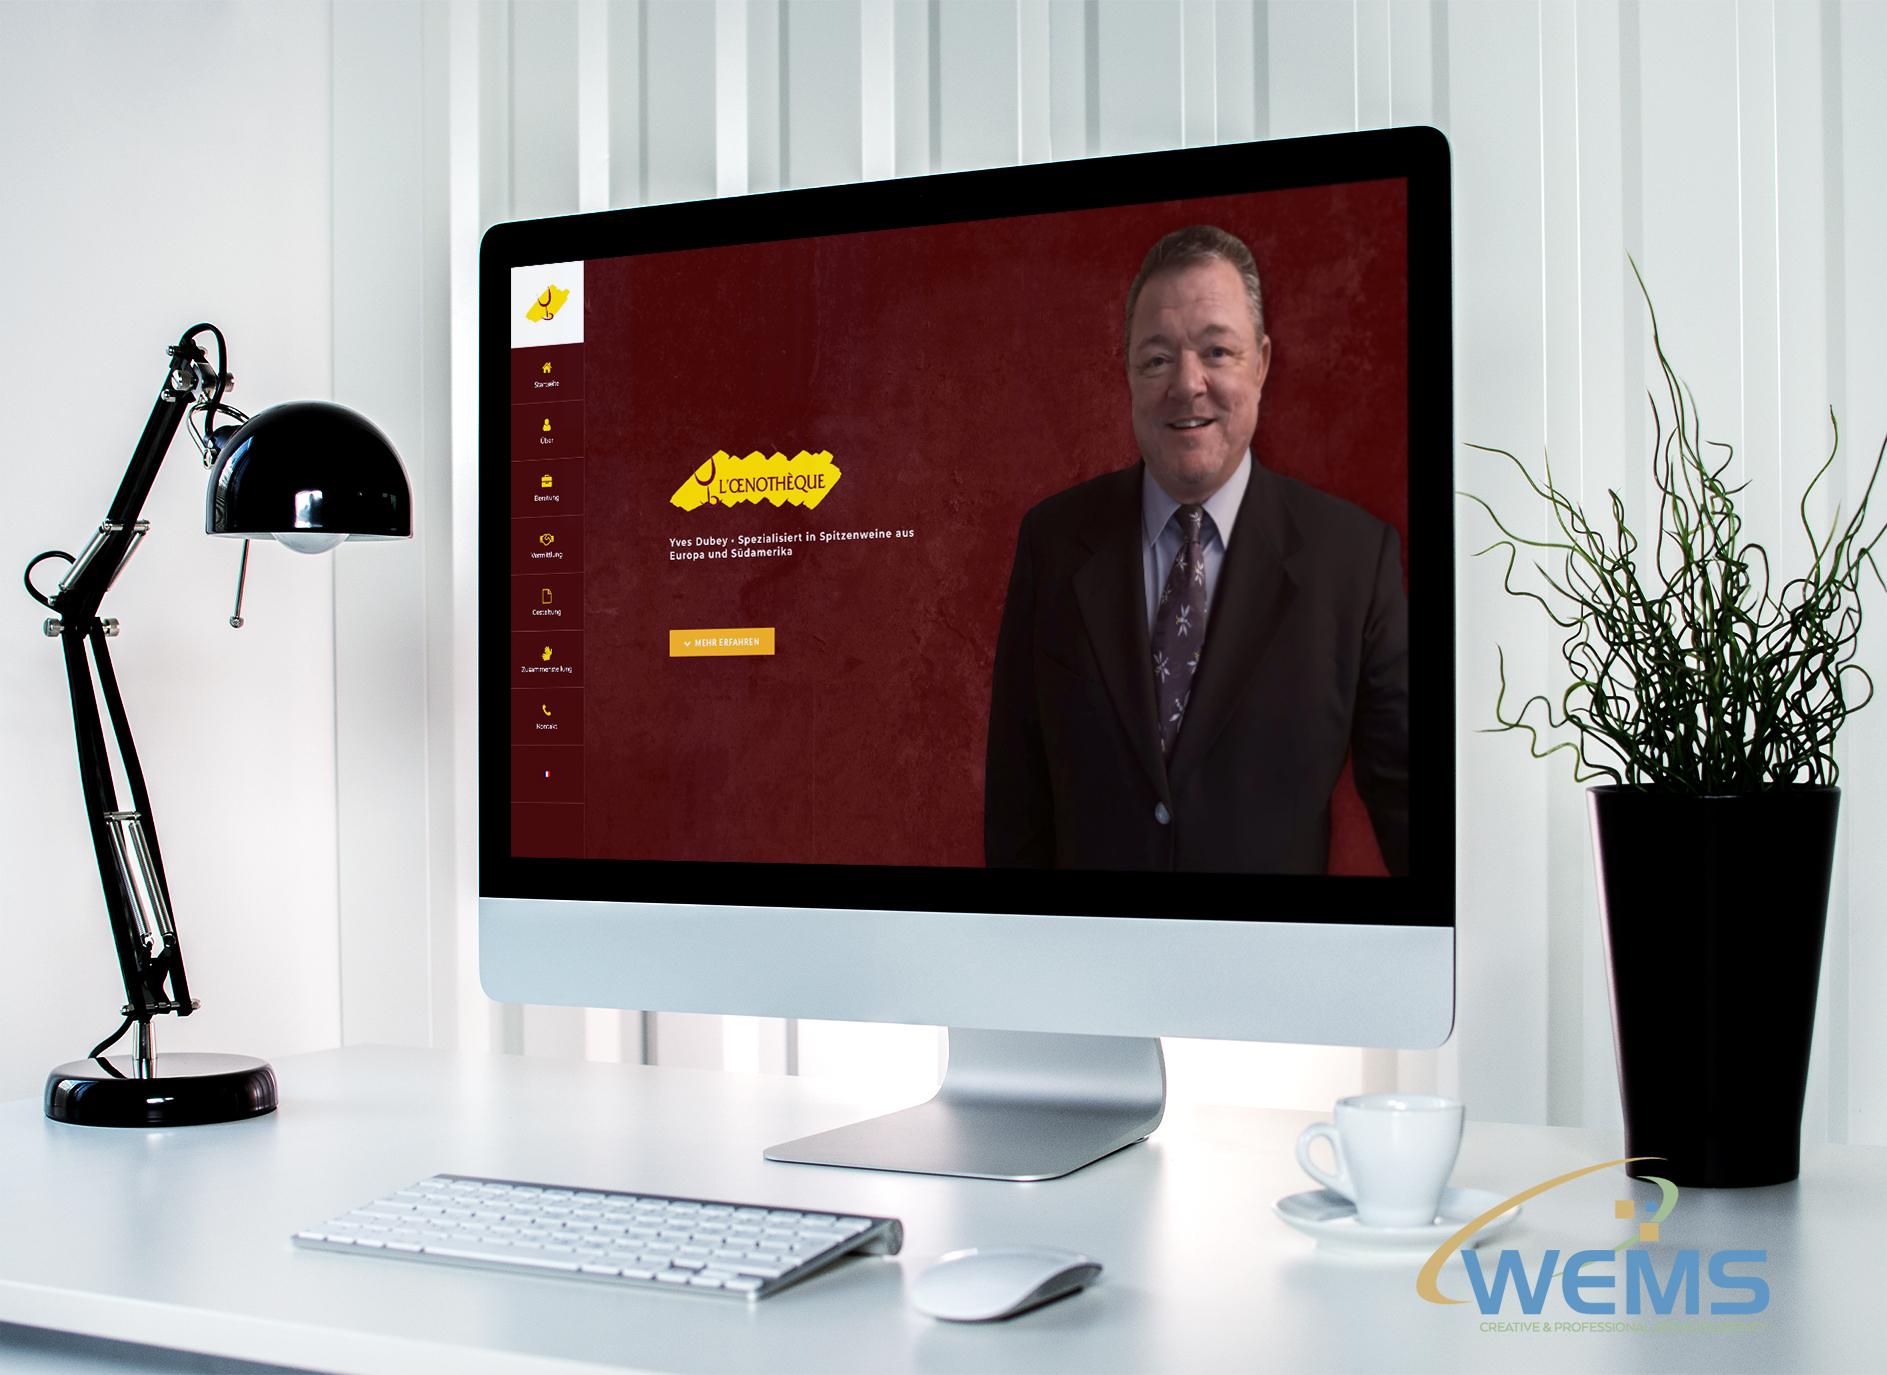 wems agency webdesign mockup l oenotheque mockup - Webdesign und Suchmaschinenoptimierung (SEO) Agentur